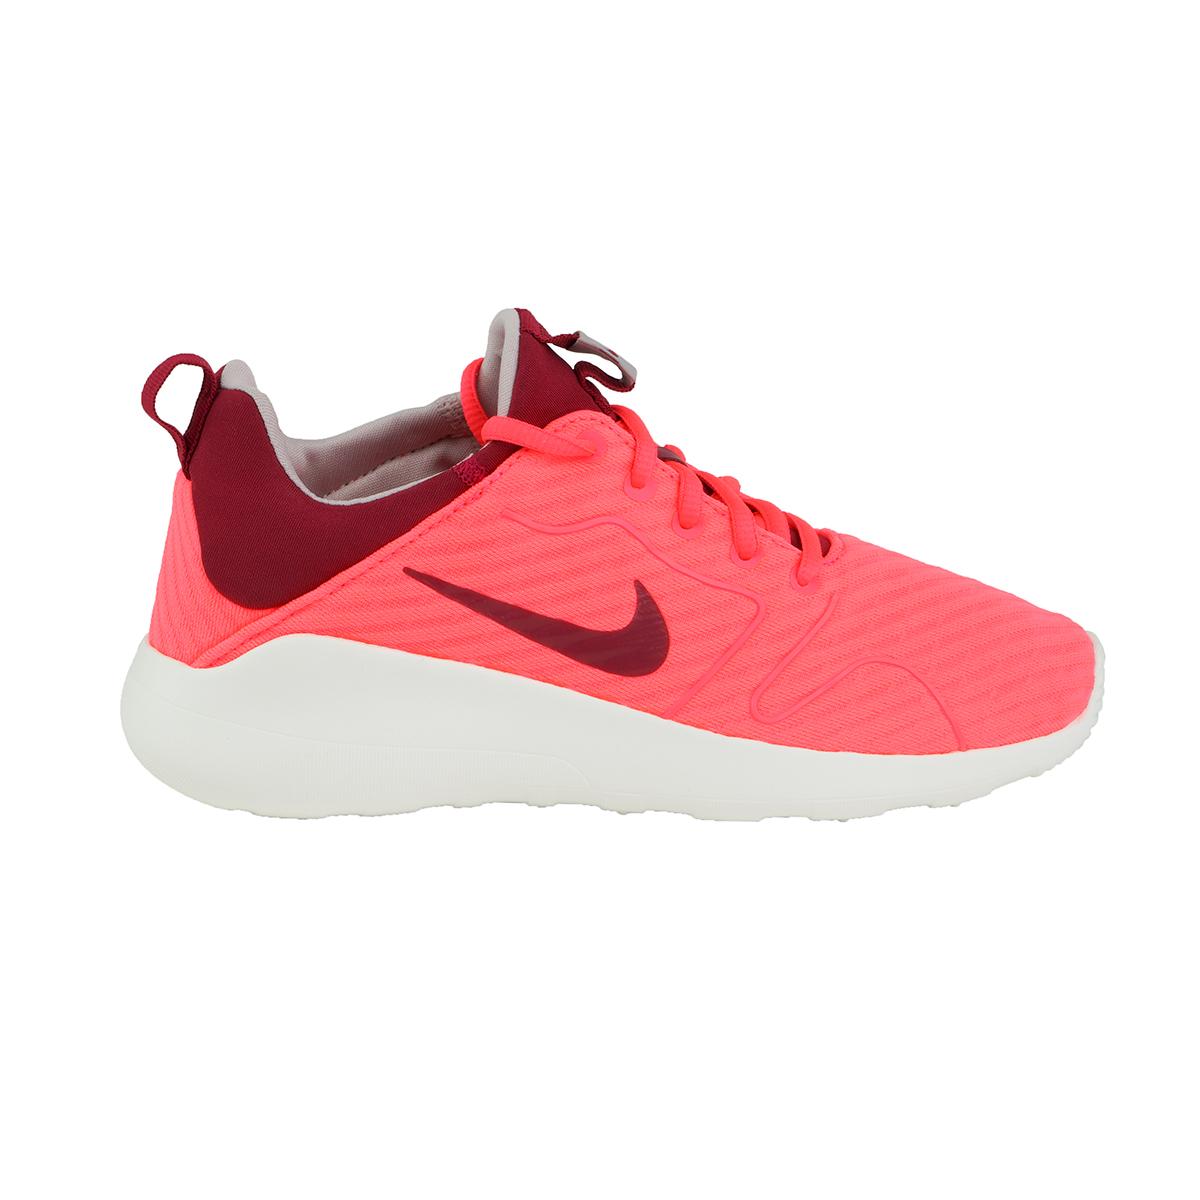 ef684c316678 Details about Nike Women s Kaishi 2.0 SE Running Shoes